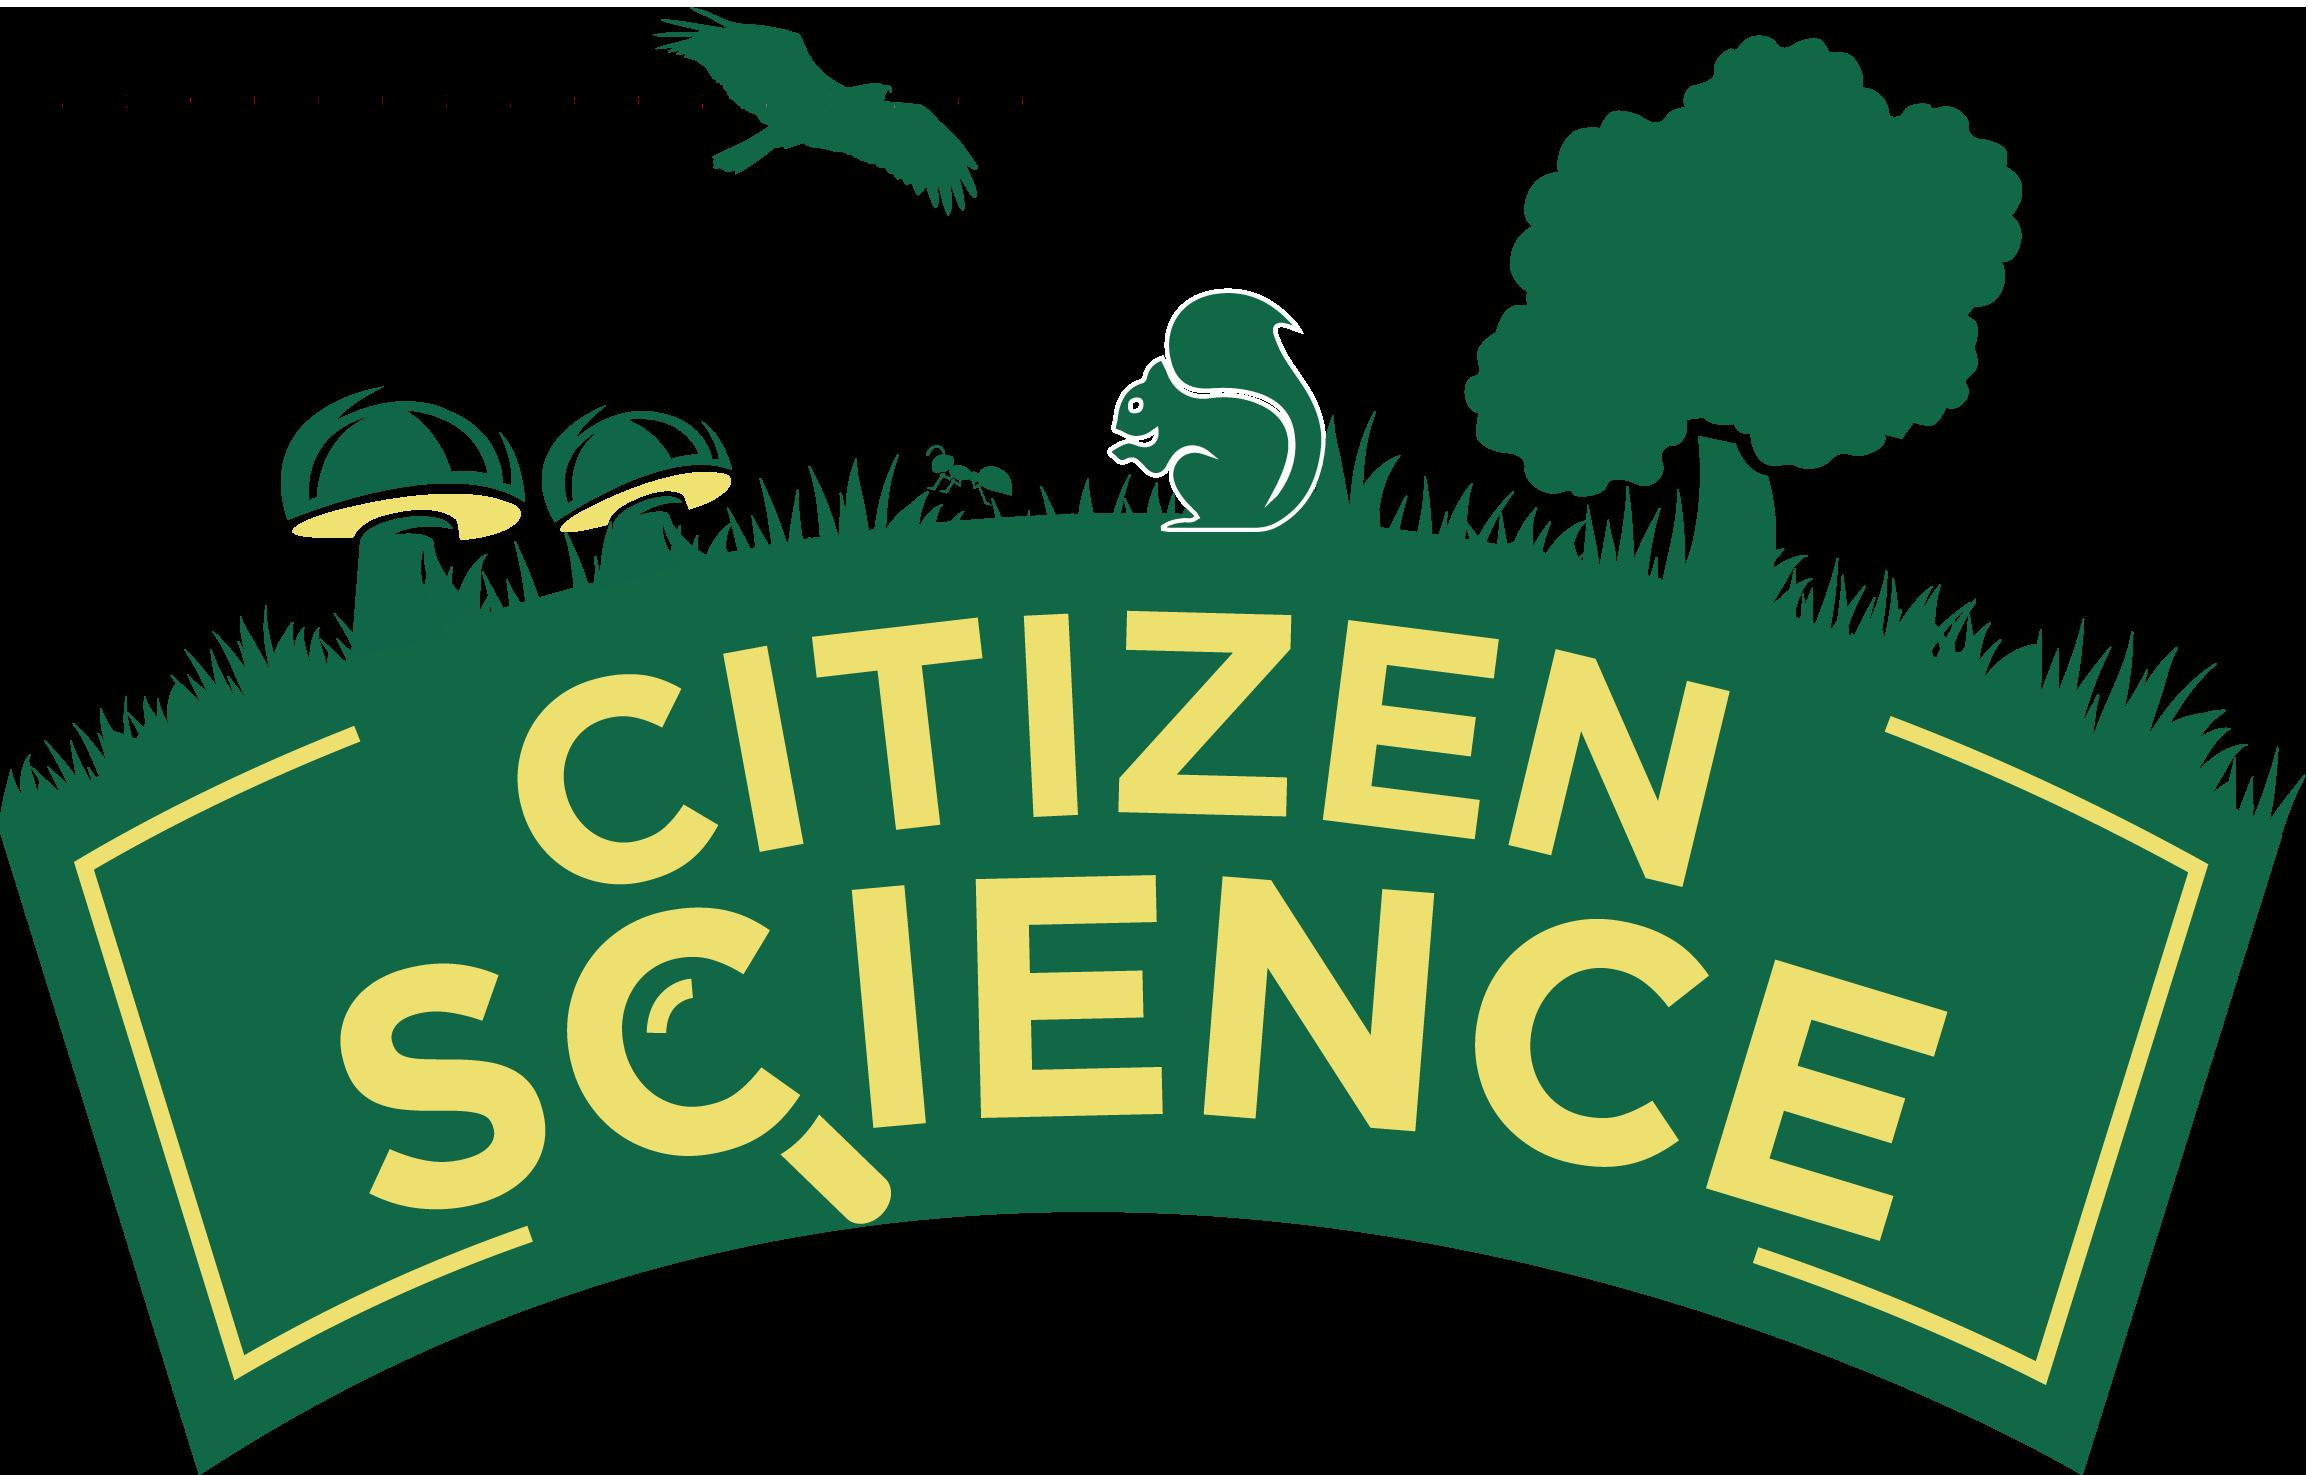 CitizenScienceLogo_4c.png